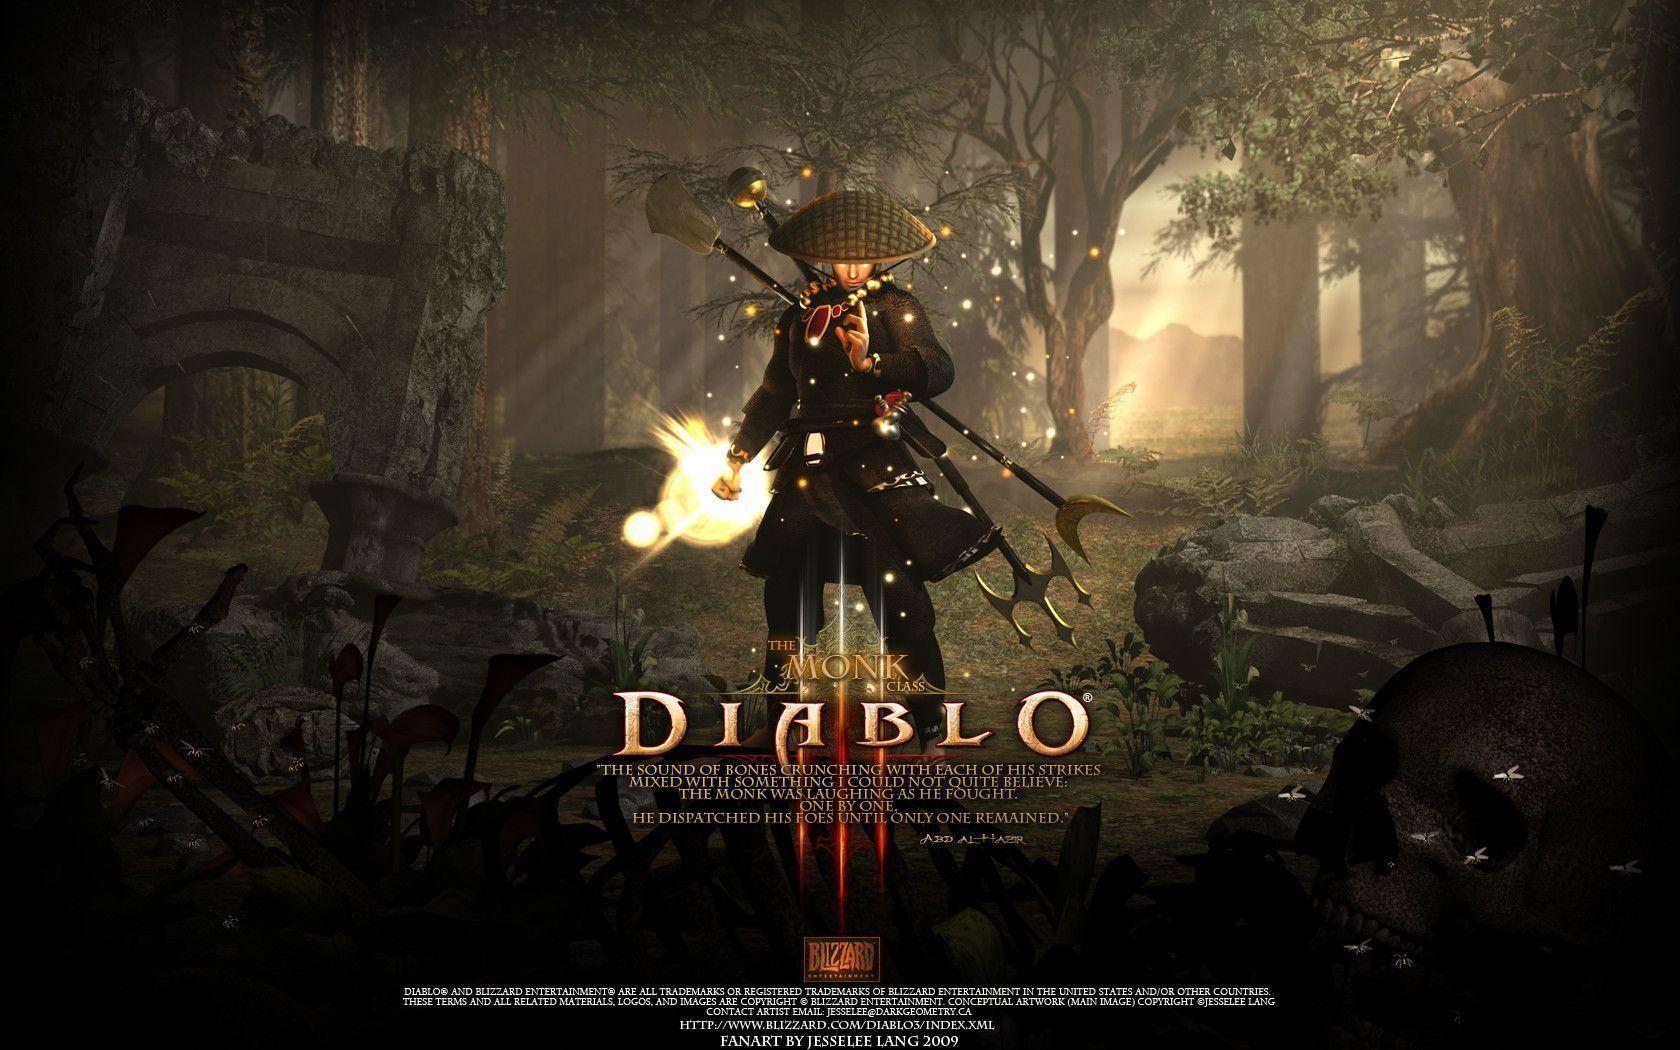 Diablo 3 Wallpapers Wallpaper Cave